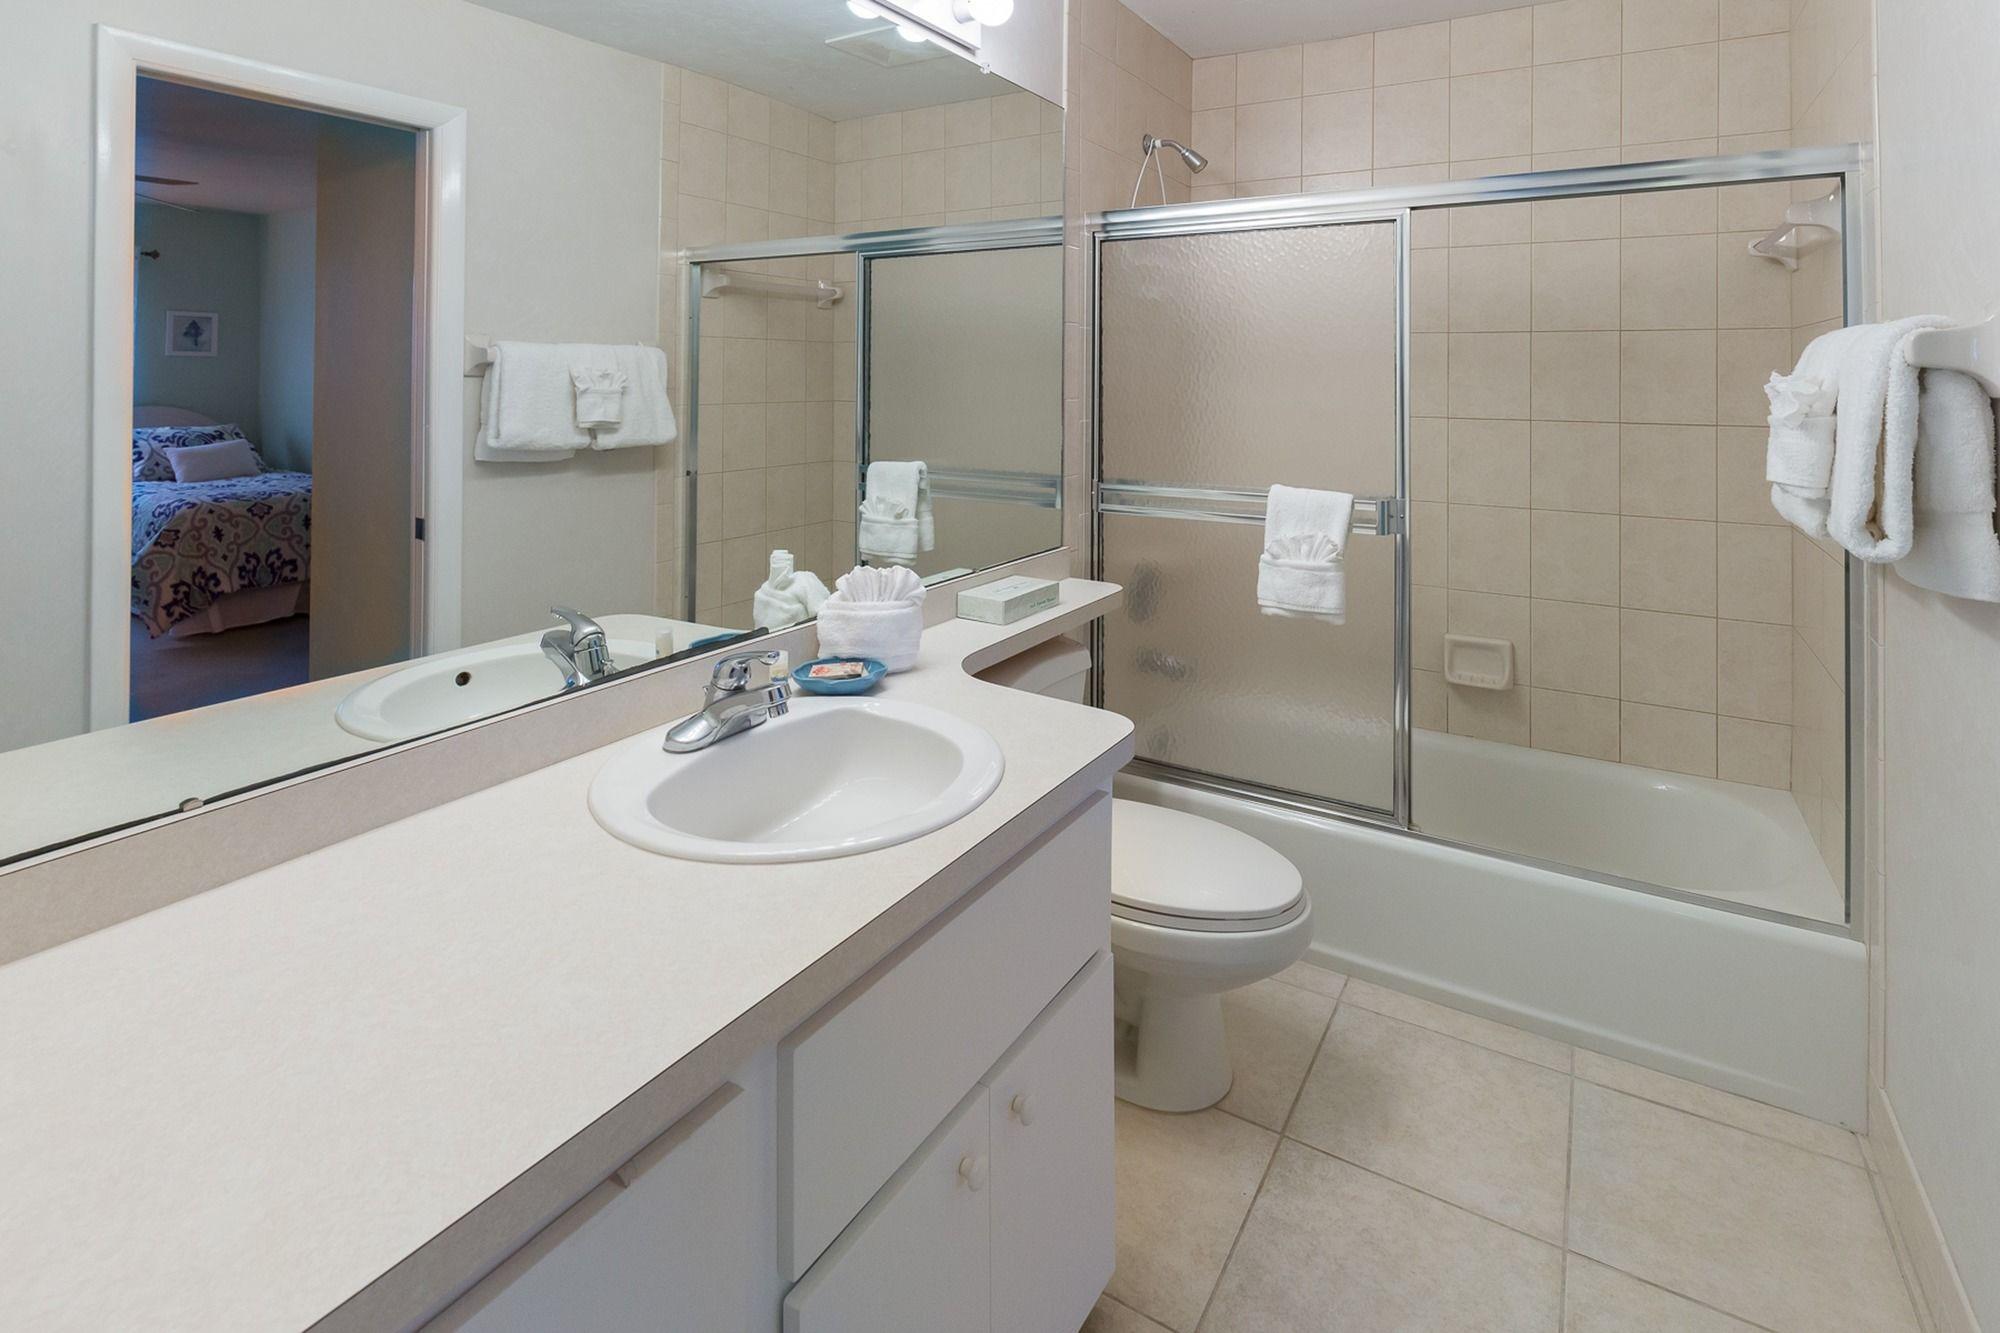 Sanibel Arms West Condominiums in Sanibel, FL